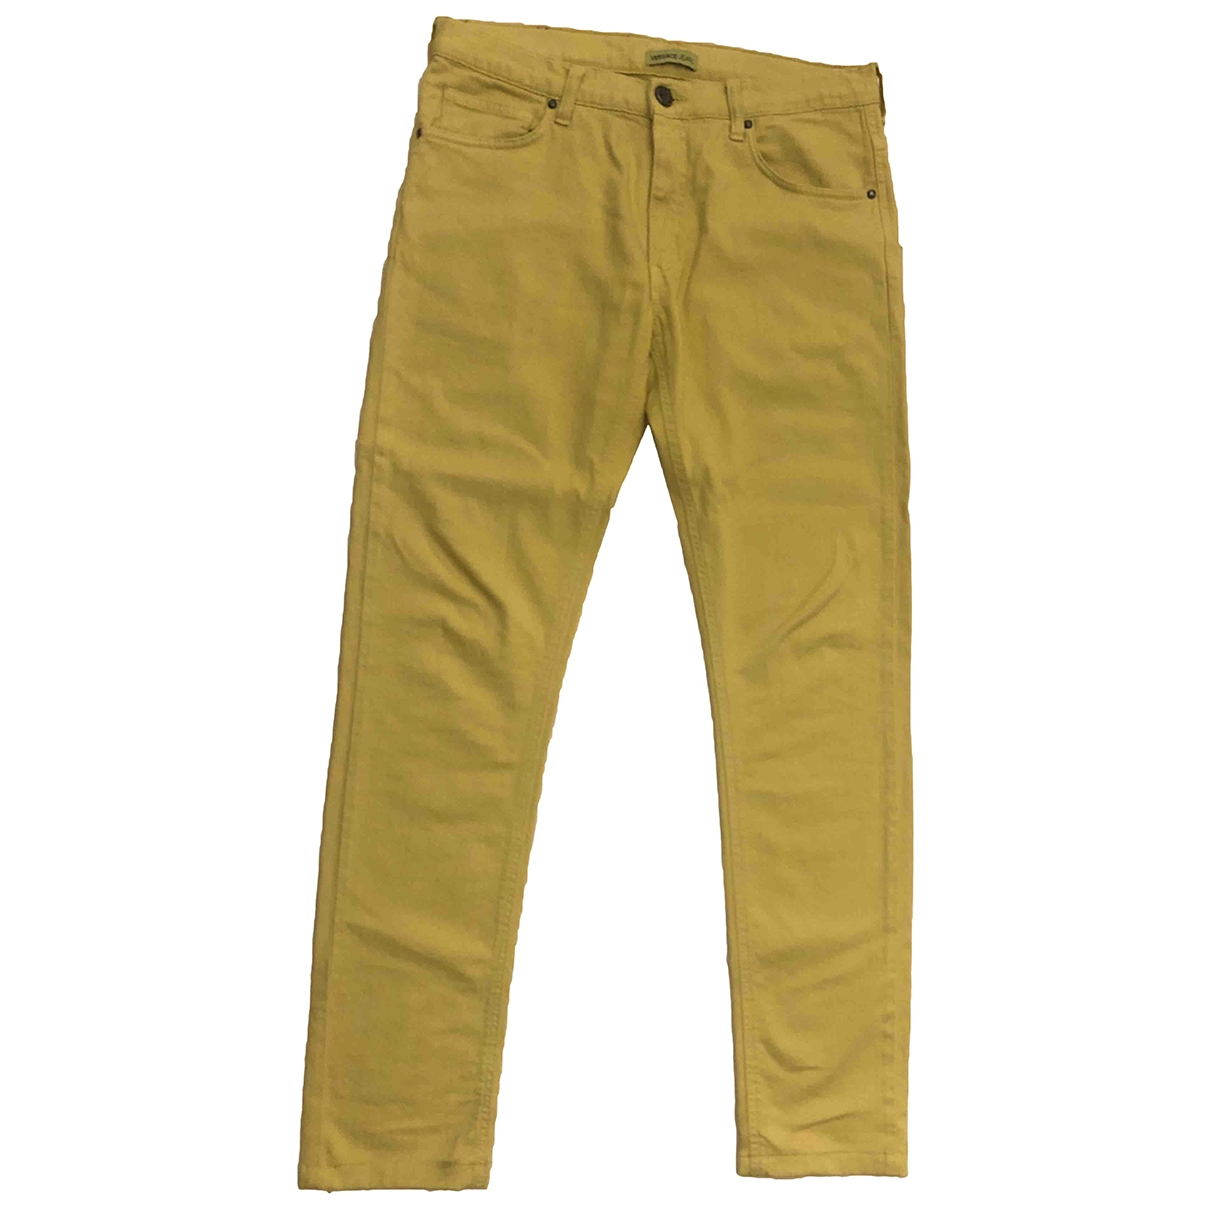 Versace Jeans \N Yellow Denim - Jeans Trousers for Men 48 IT